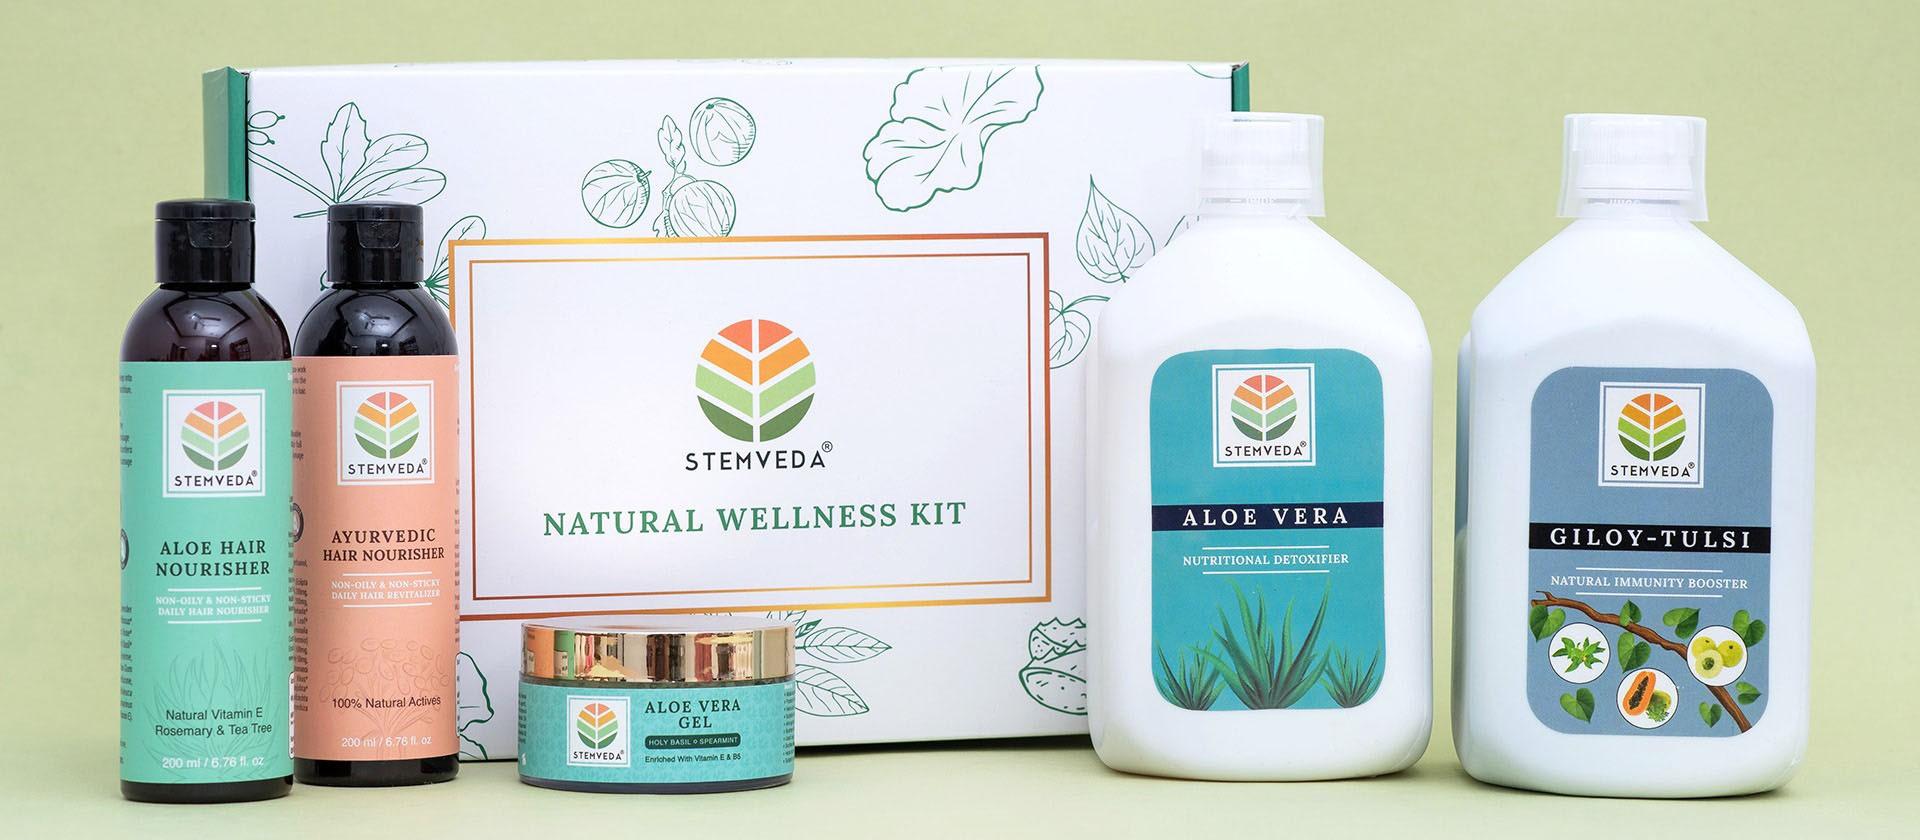 STEMVEDA Home Page Gift Pack Banner.jpg